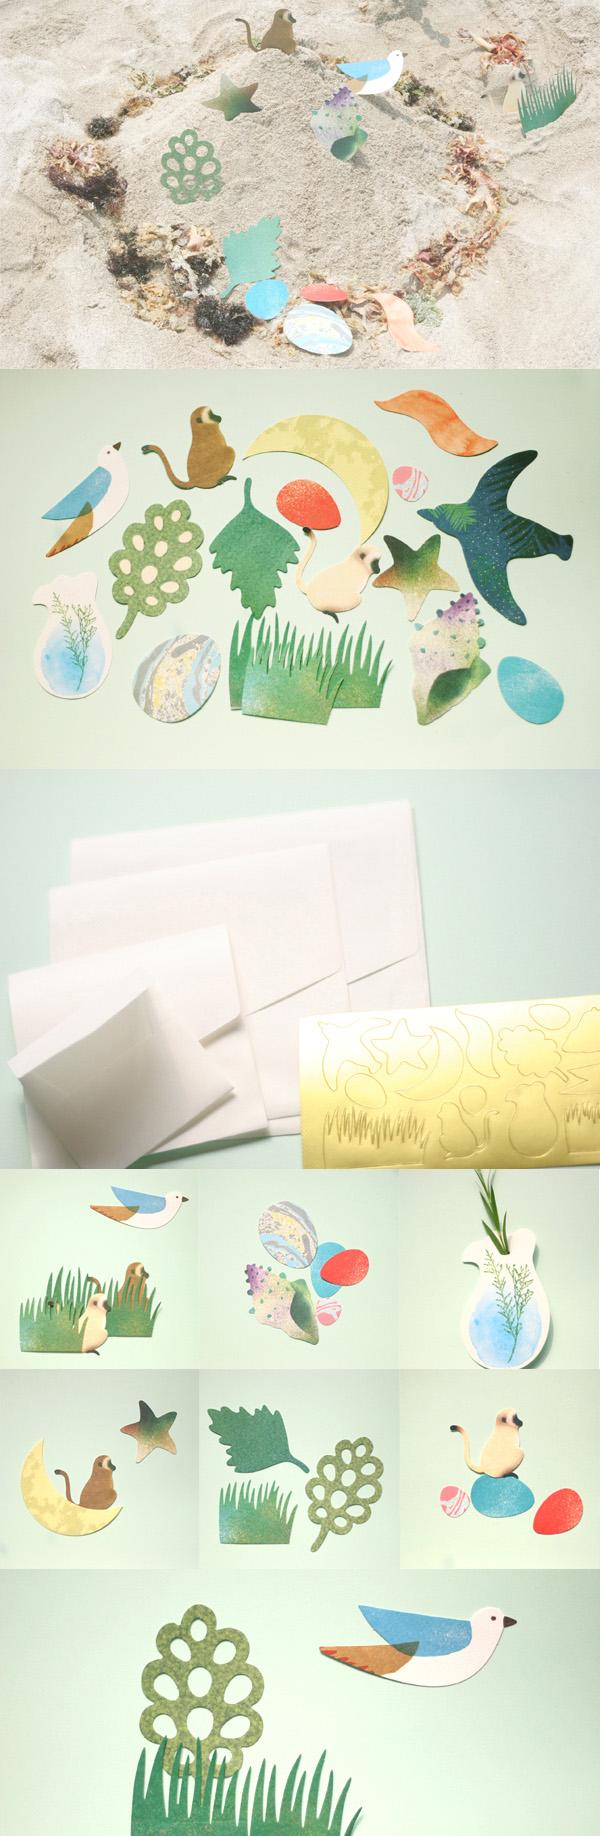 Memories-CARD8,000원-소격동 문방구디자인문구, 카드/편지/봉투, 디자인카드, 일러스트바보사랑Memories-CARD8,000원-소격동 문방구디자인문구, 카드/편지/봉투, 디자인카드, 일러스트바보사랑